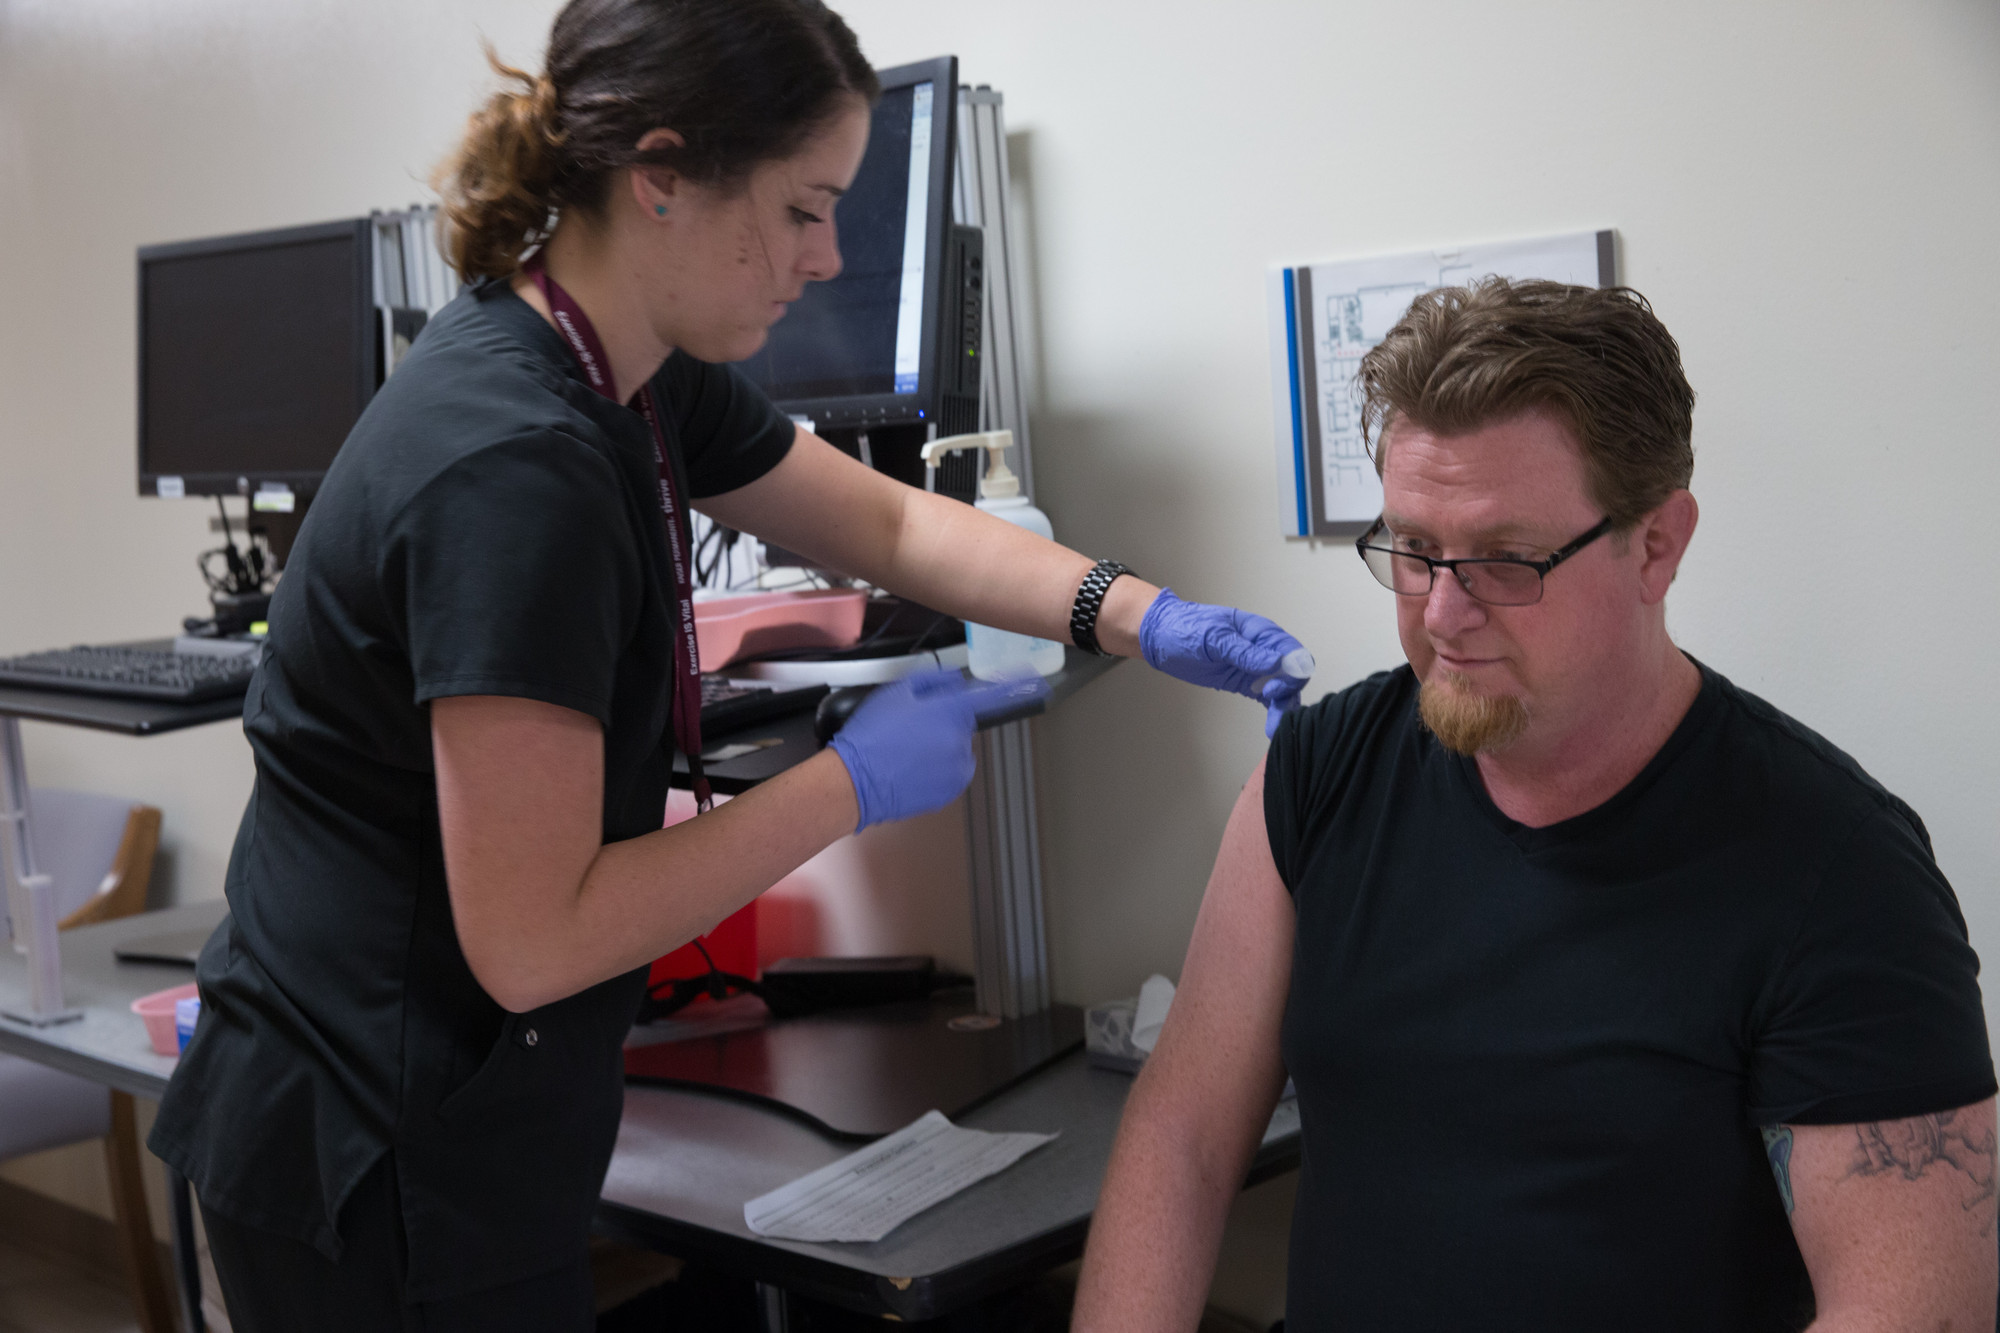 Nurse gives flu shot.